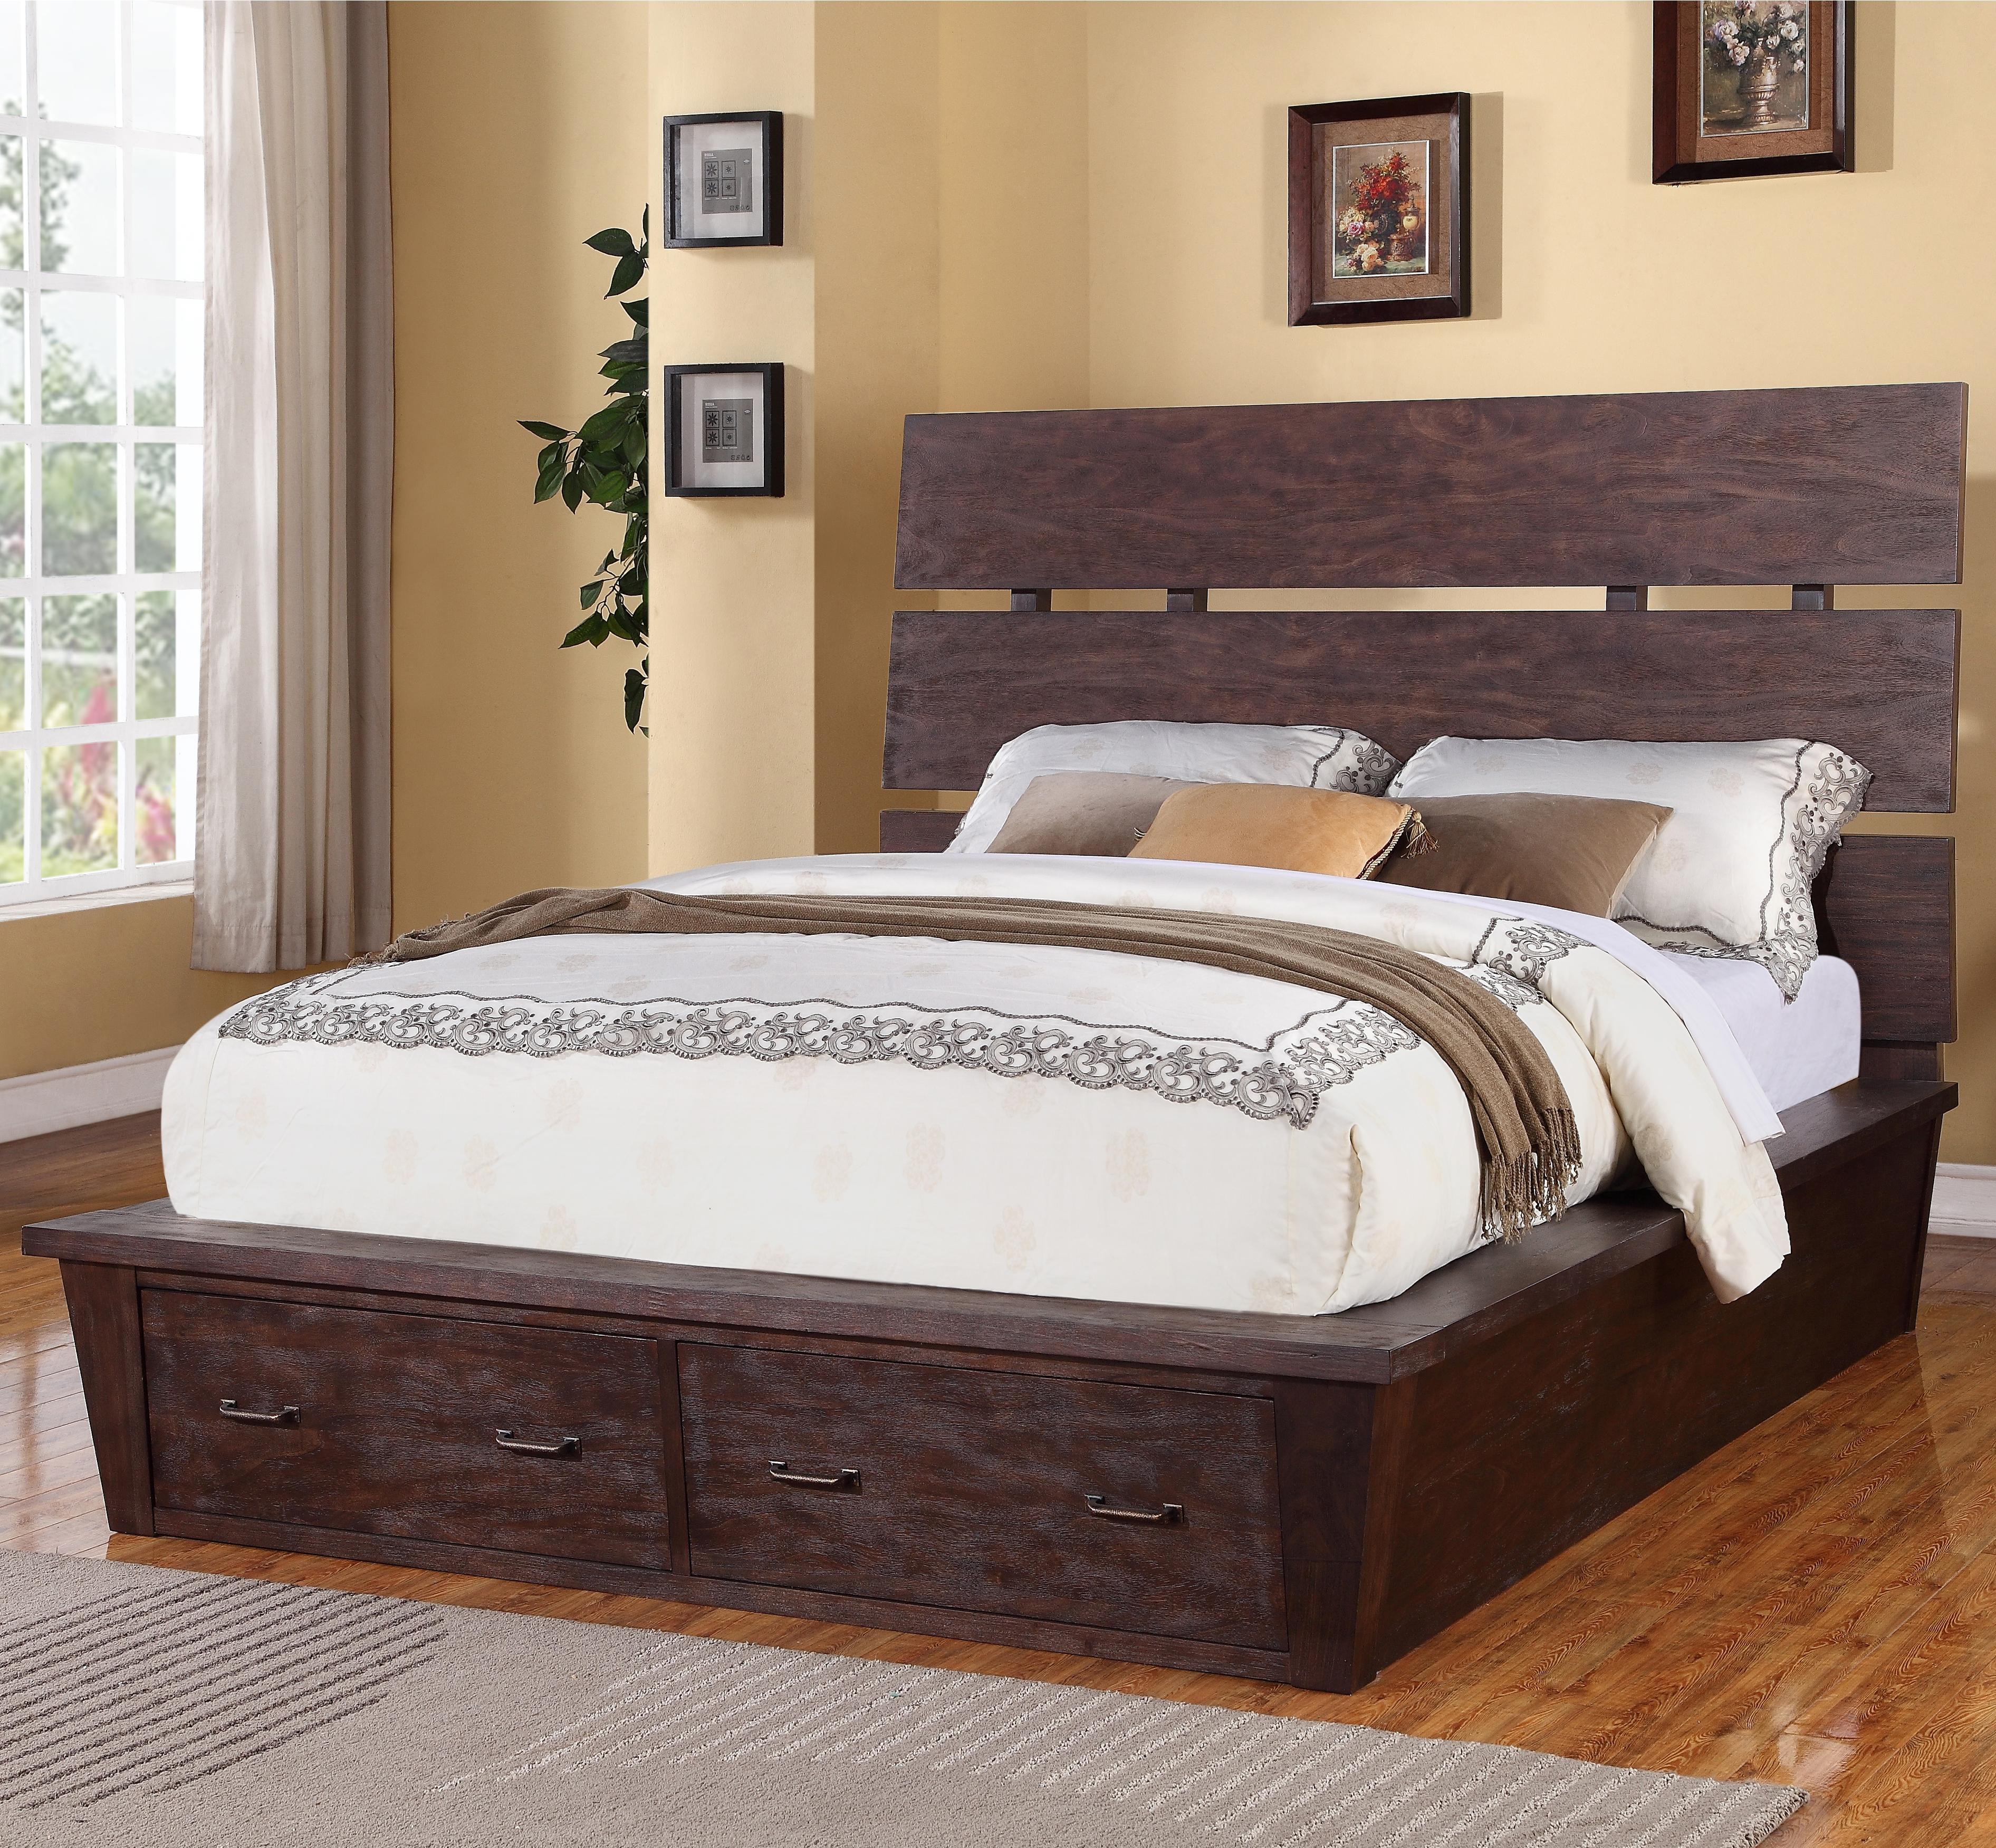 promenade king platform storage bed with 2 drawers by riverside furniture wolf furniture. Black Bedroom Furniture Sets. Home Design Ideas